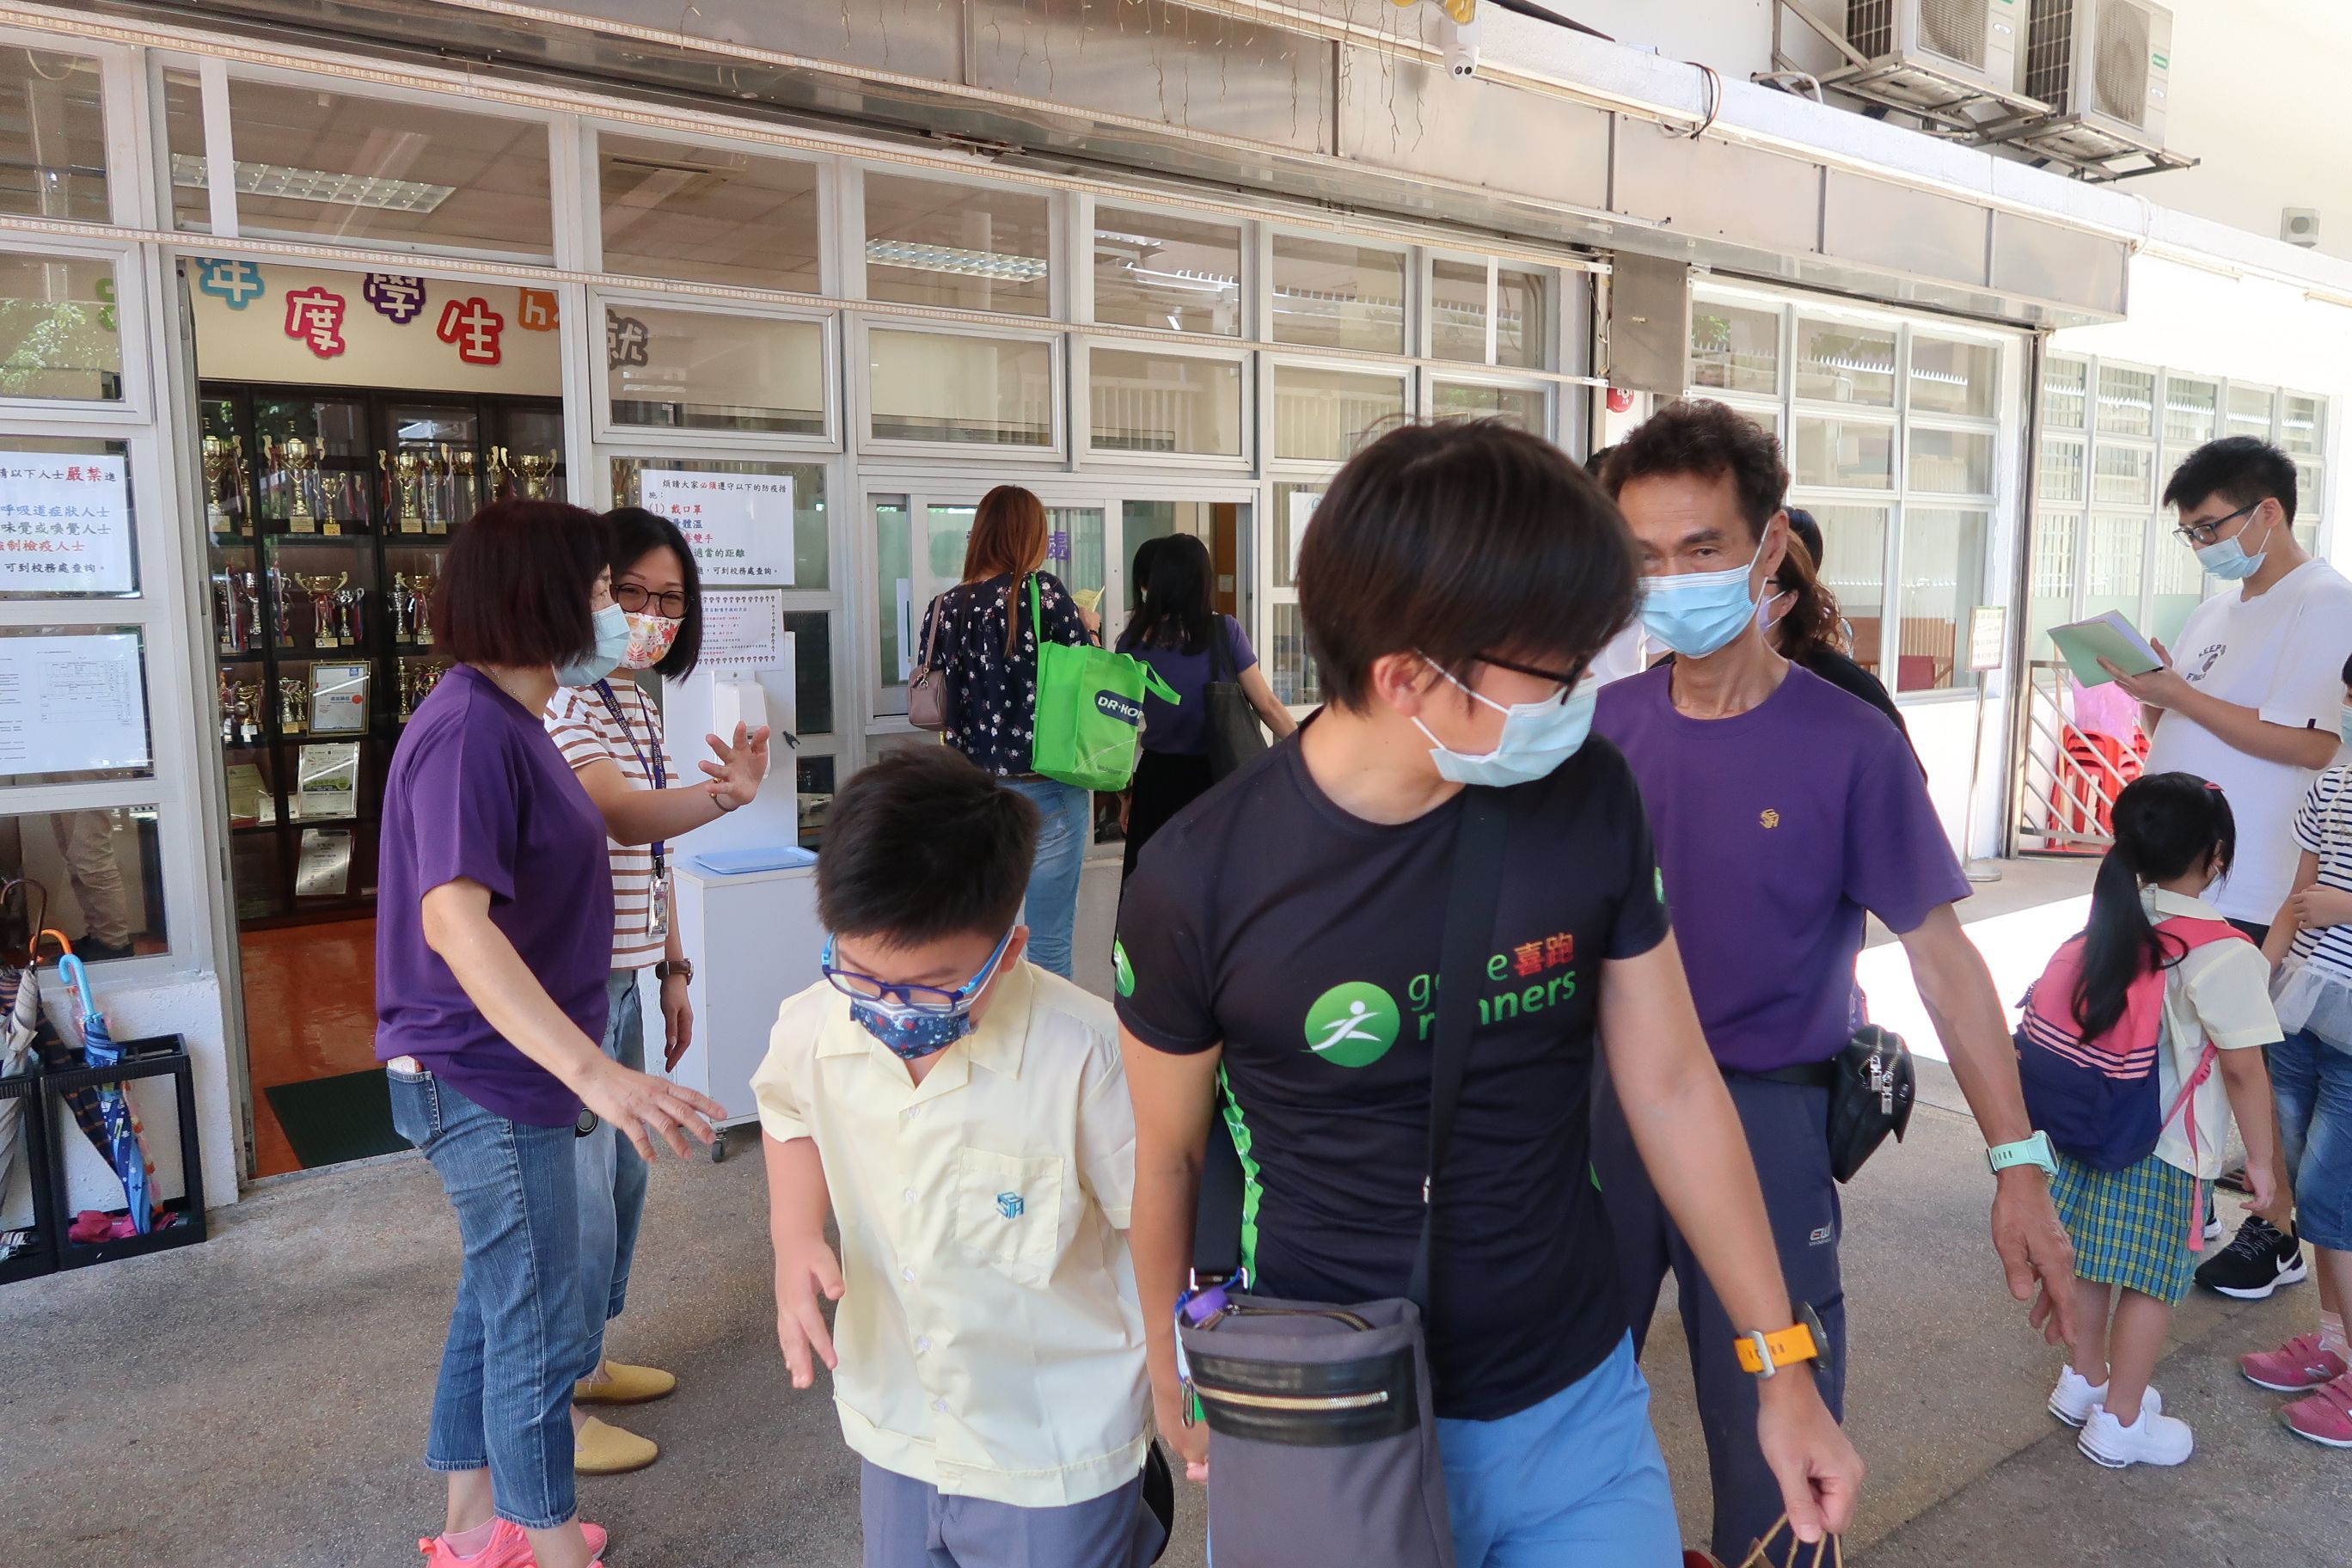 https://syh.edu.hk/sites/default/files/img_6636.jpg